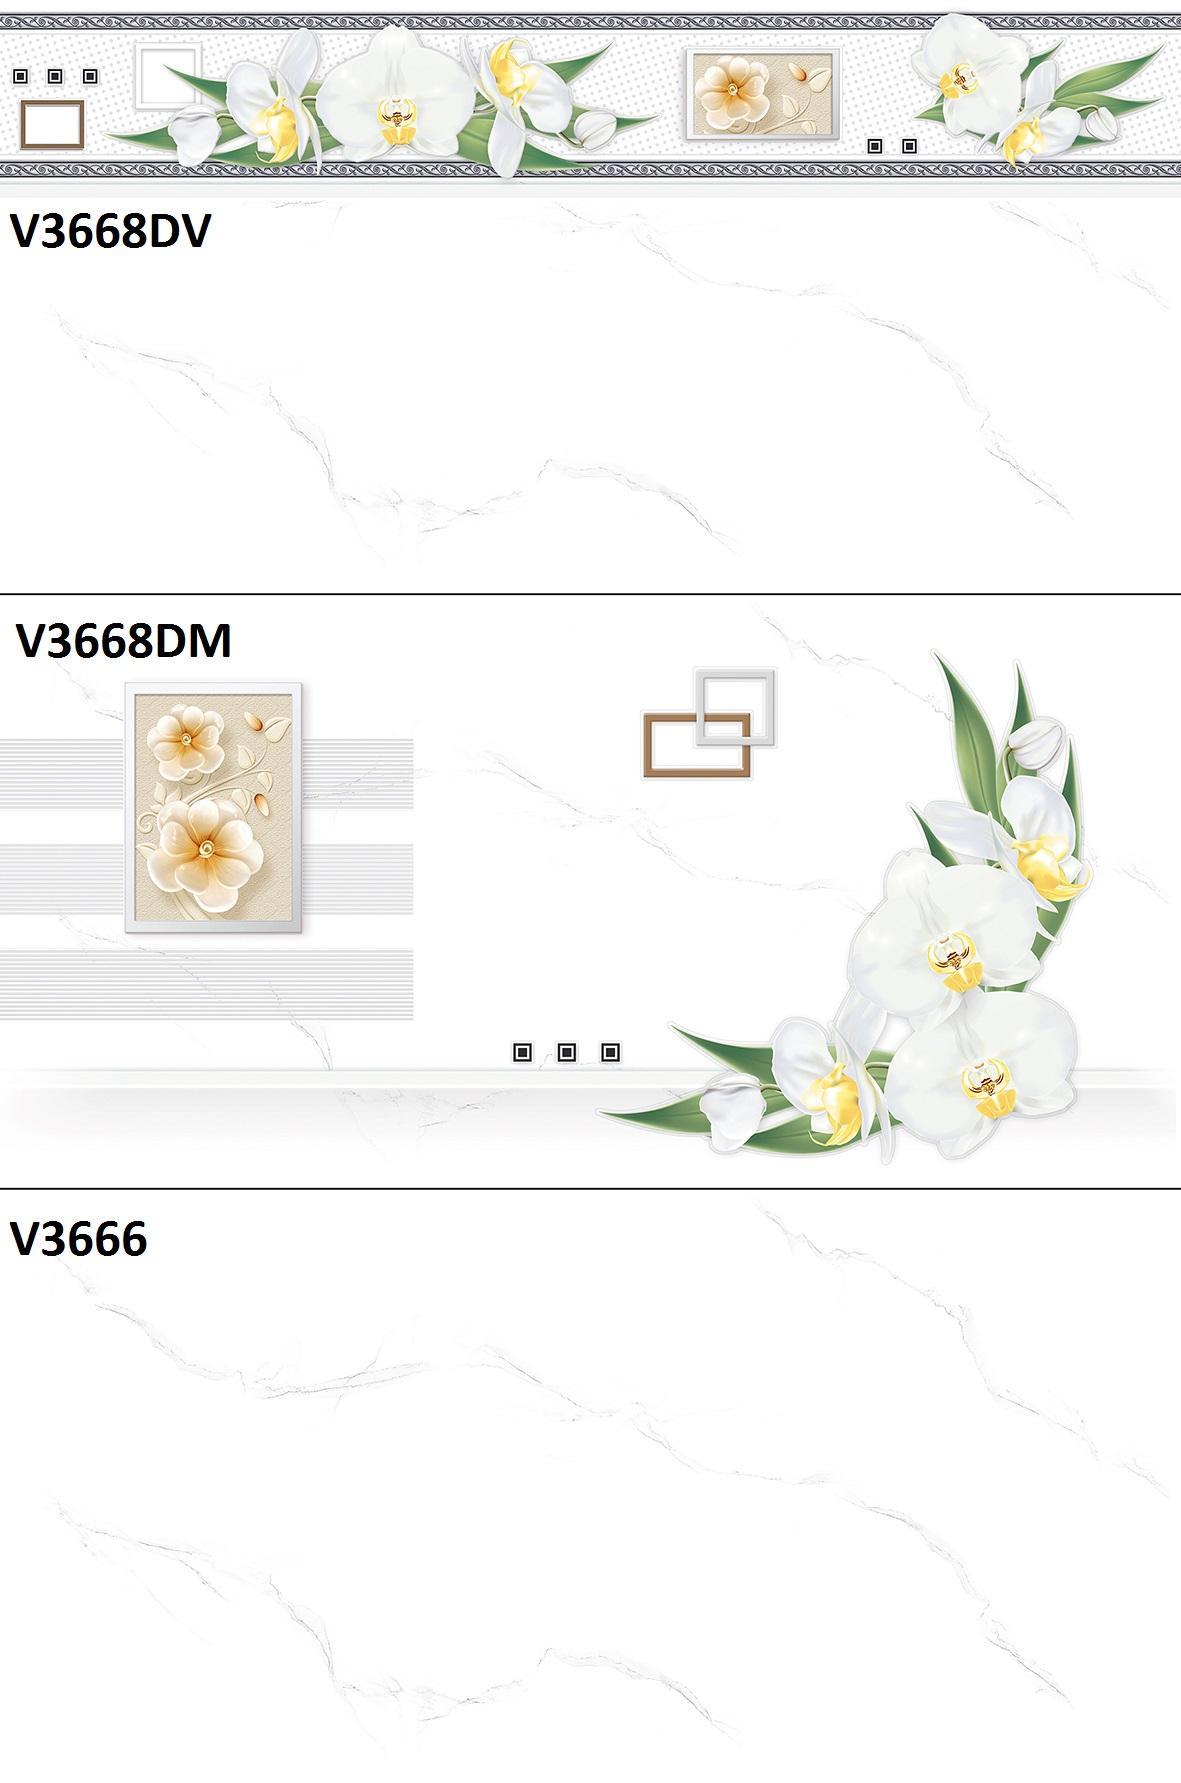 V3668